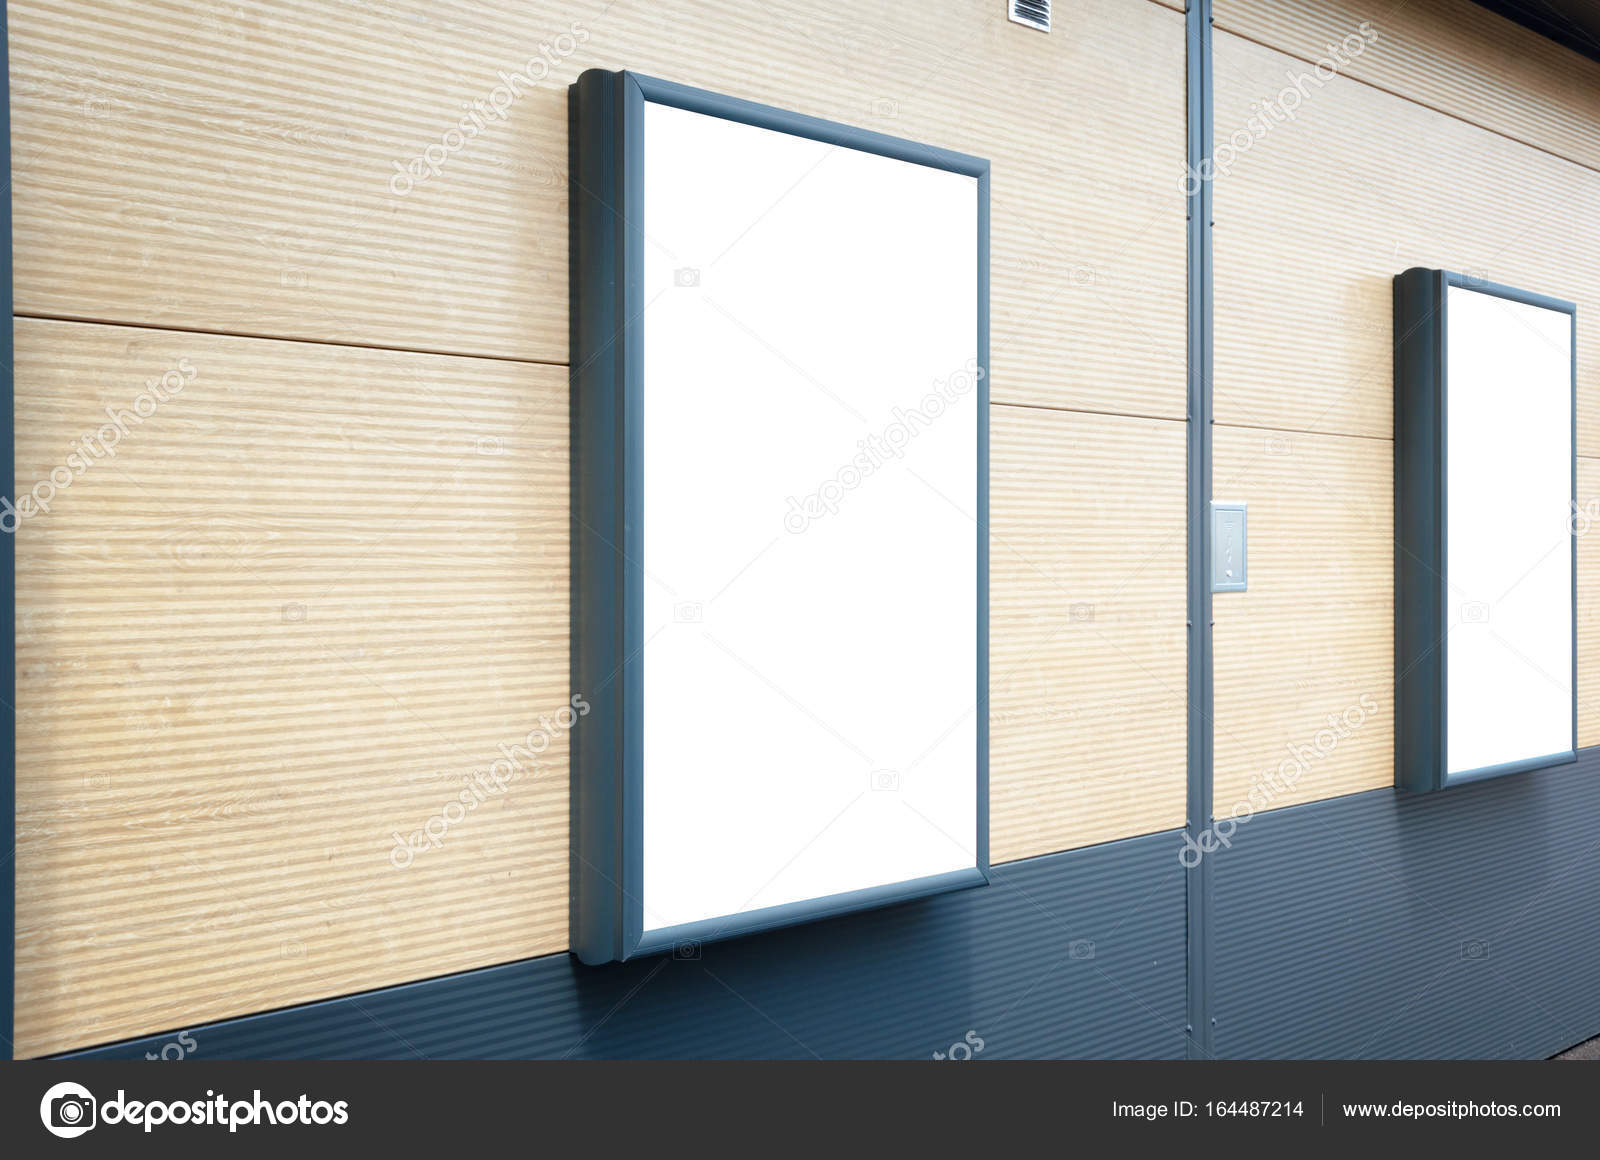 Vertical billboard mockup  Frame on shopping mall  — Stock